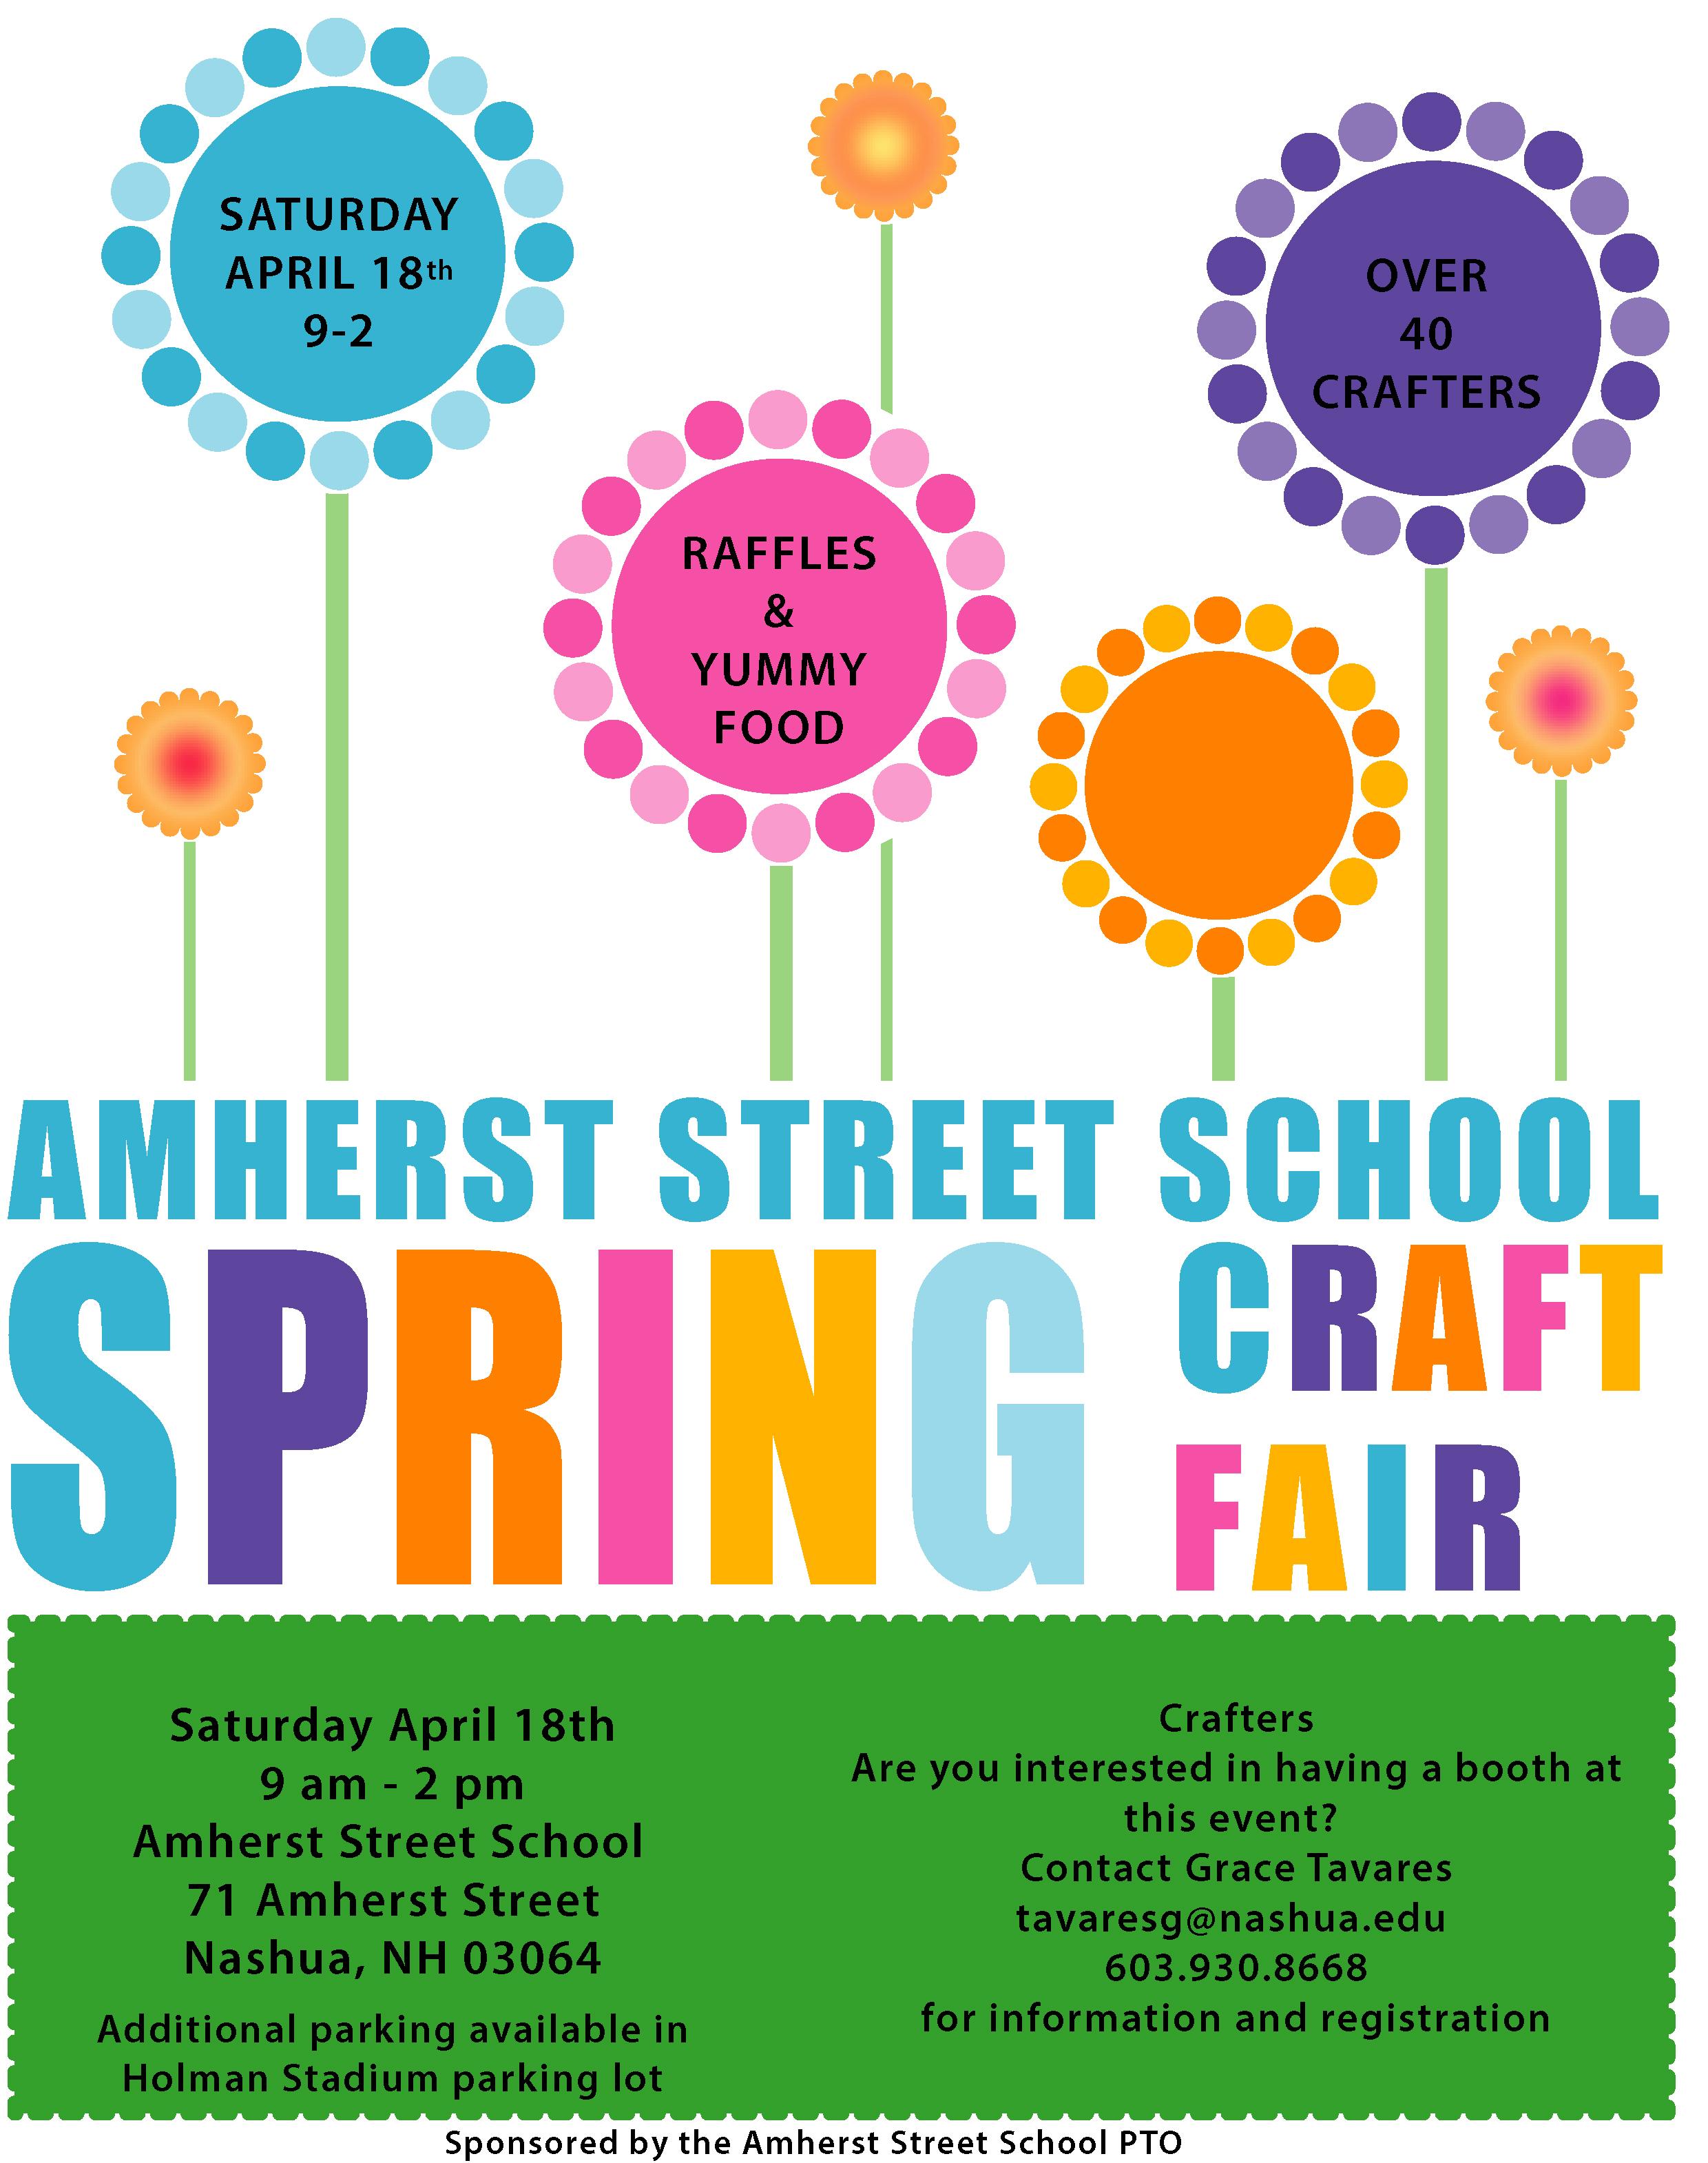 Amherst Street School Spring Craft Fair